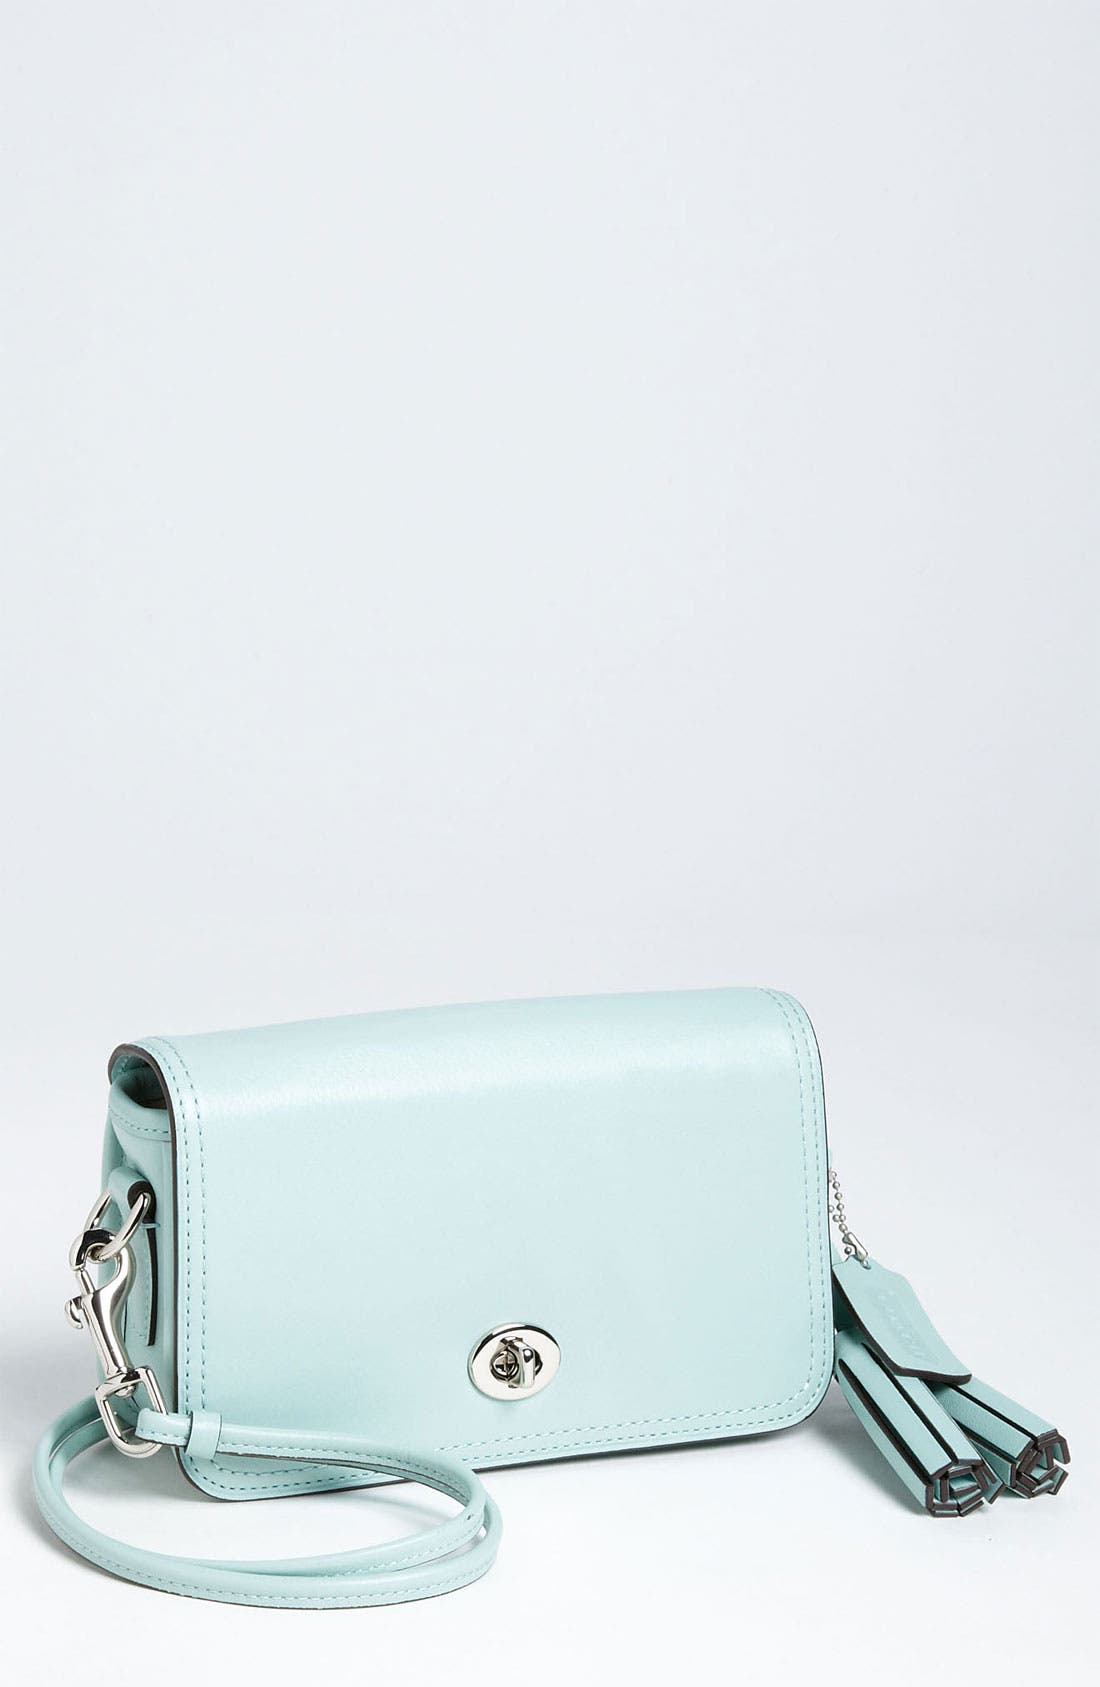 Main Image - COACH Leather Crossbody Bag